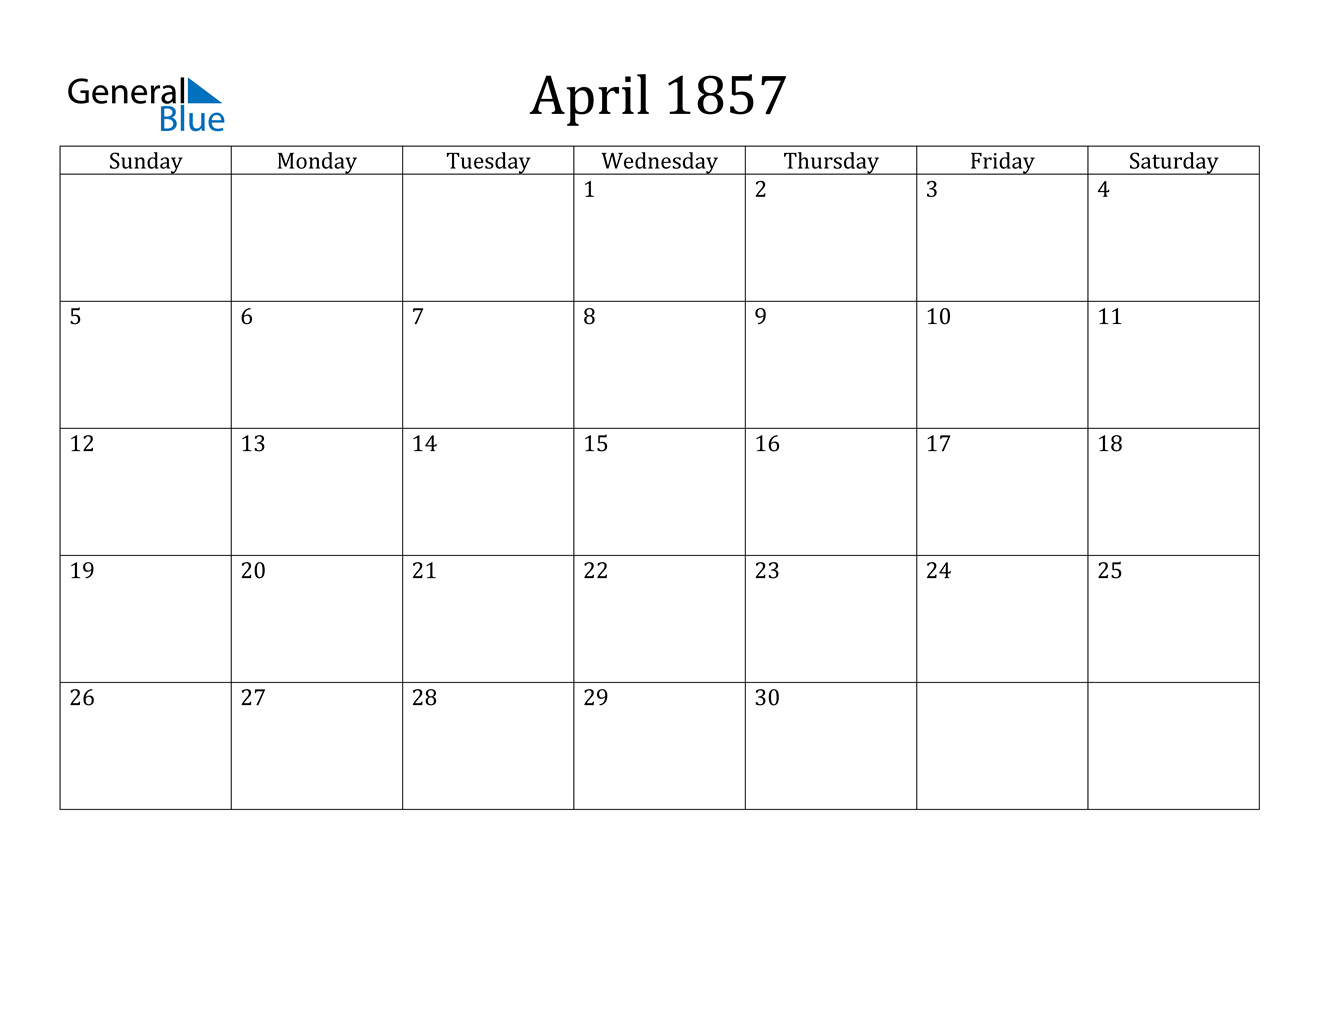 Image of April 1857 Calendar